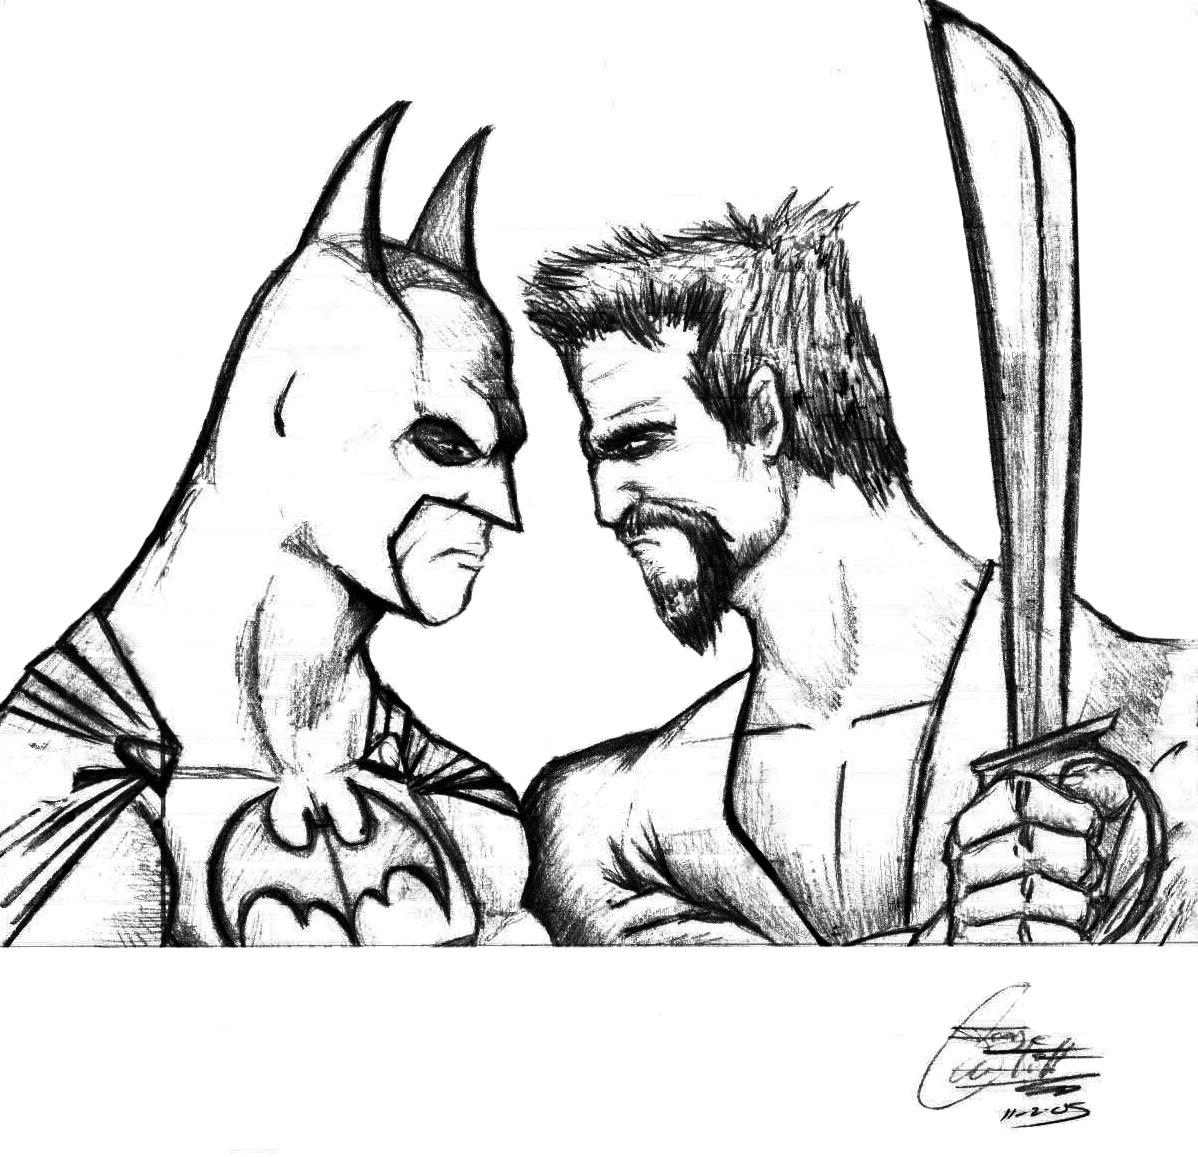 Batman vs Rah's Al Ghul sketch by IronMaiden720